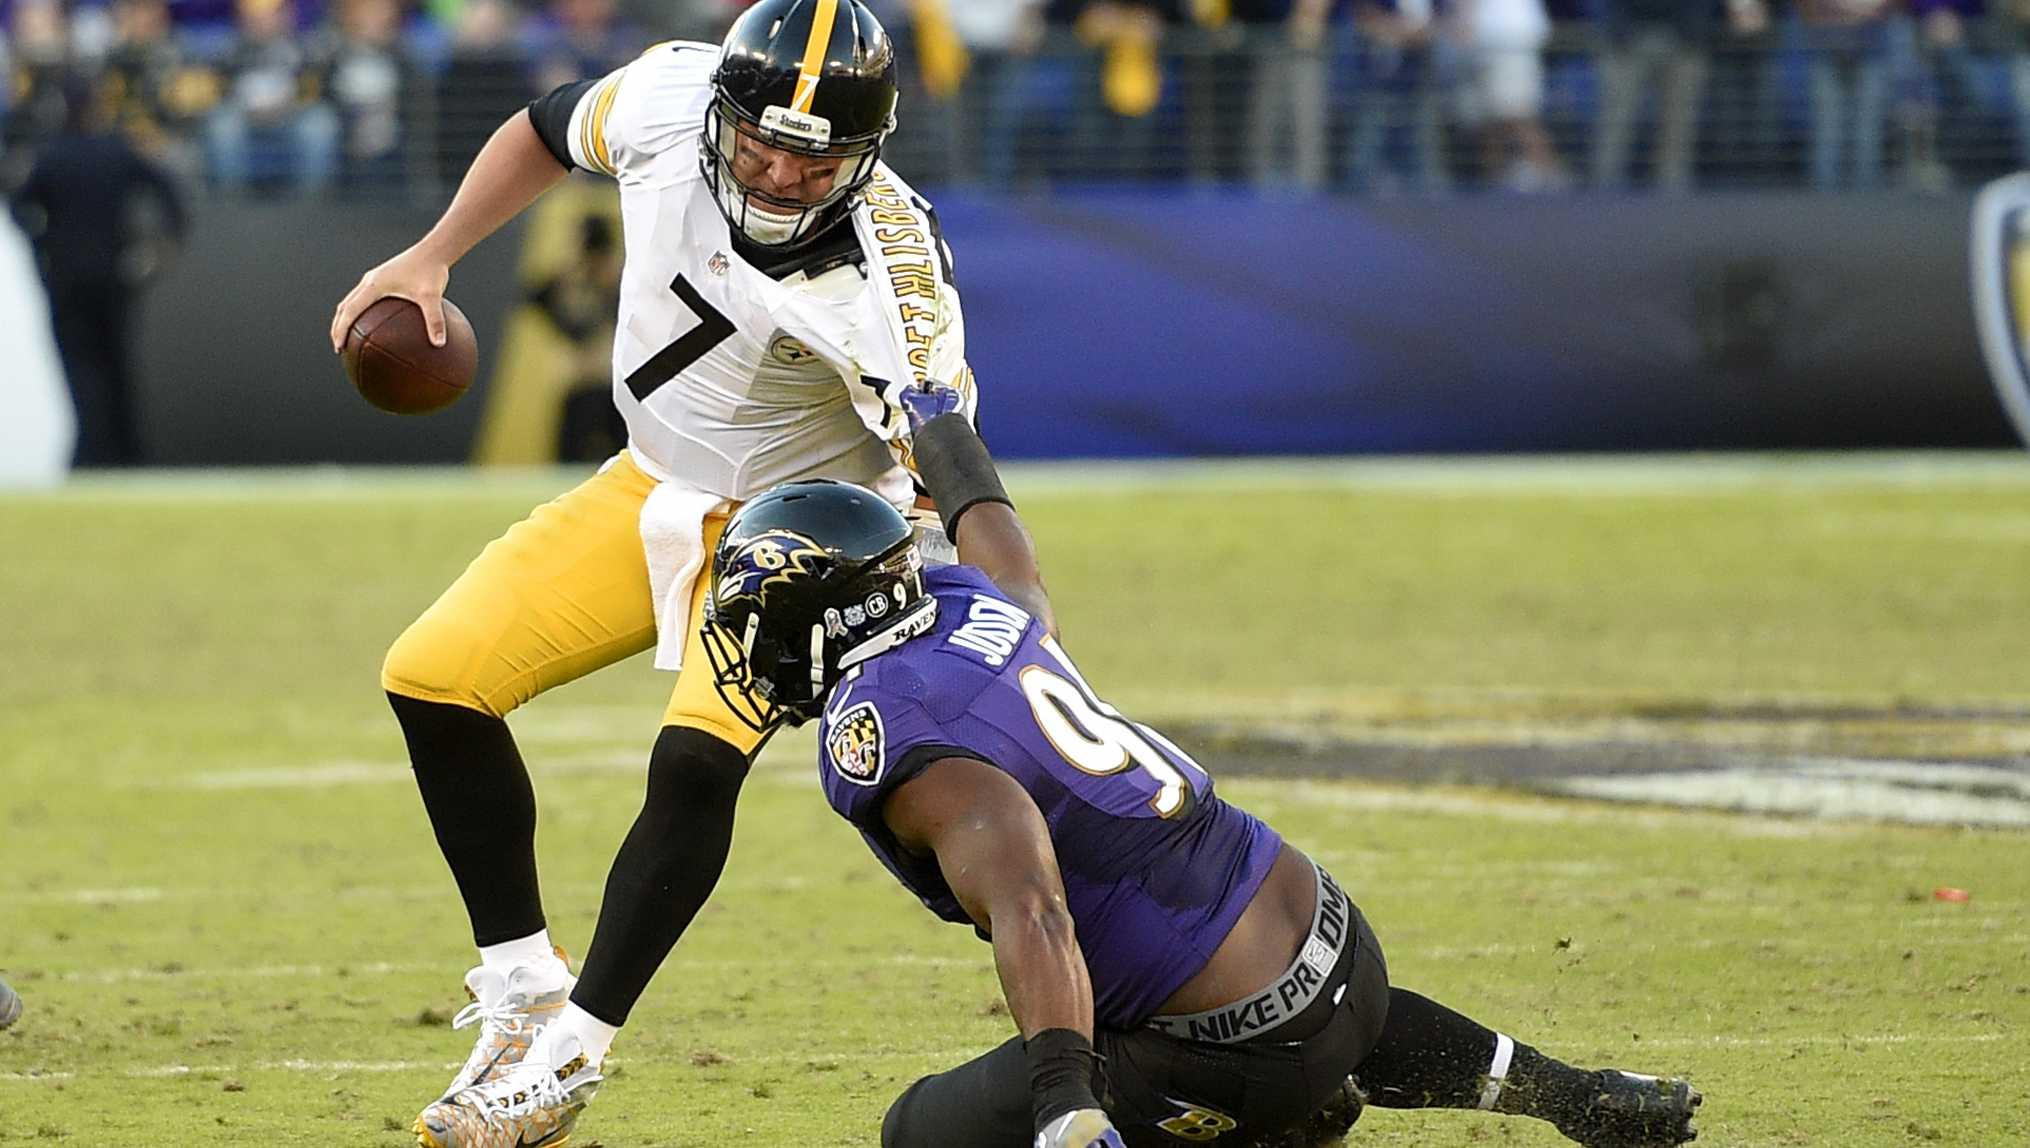 Ben Roethlisberger sacked by Baltimore Ravens LB Matt Judon